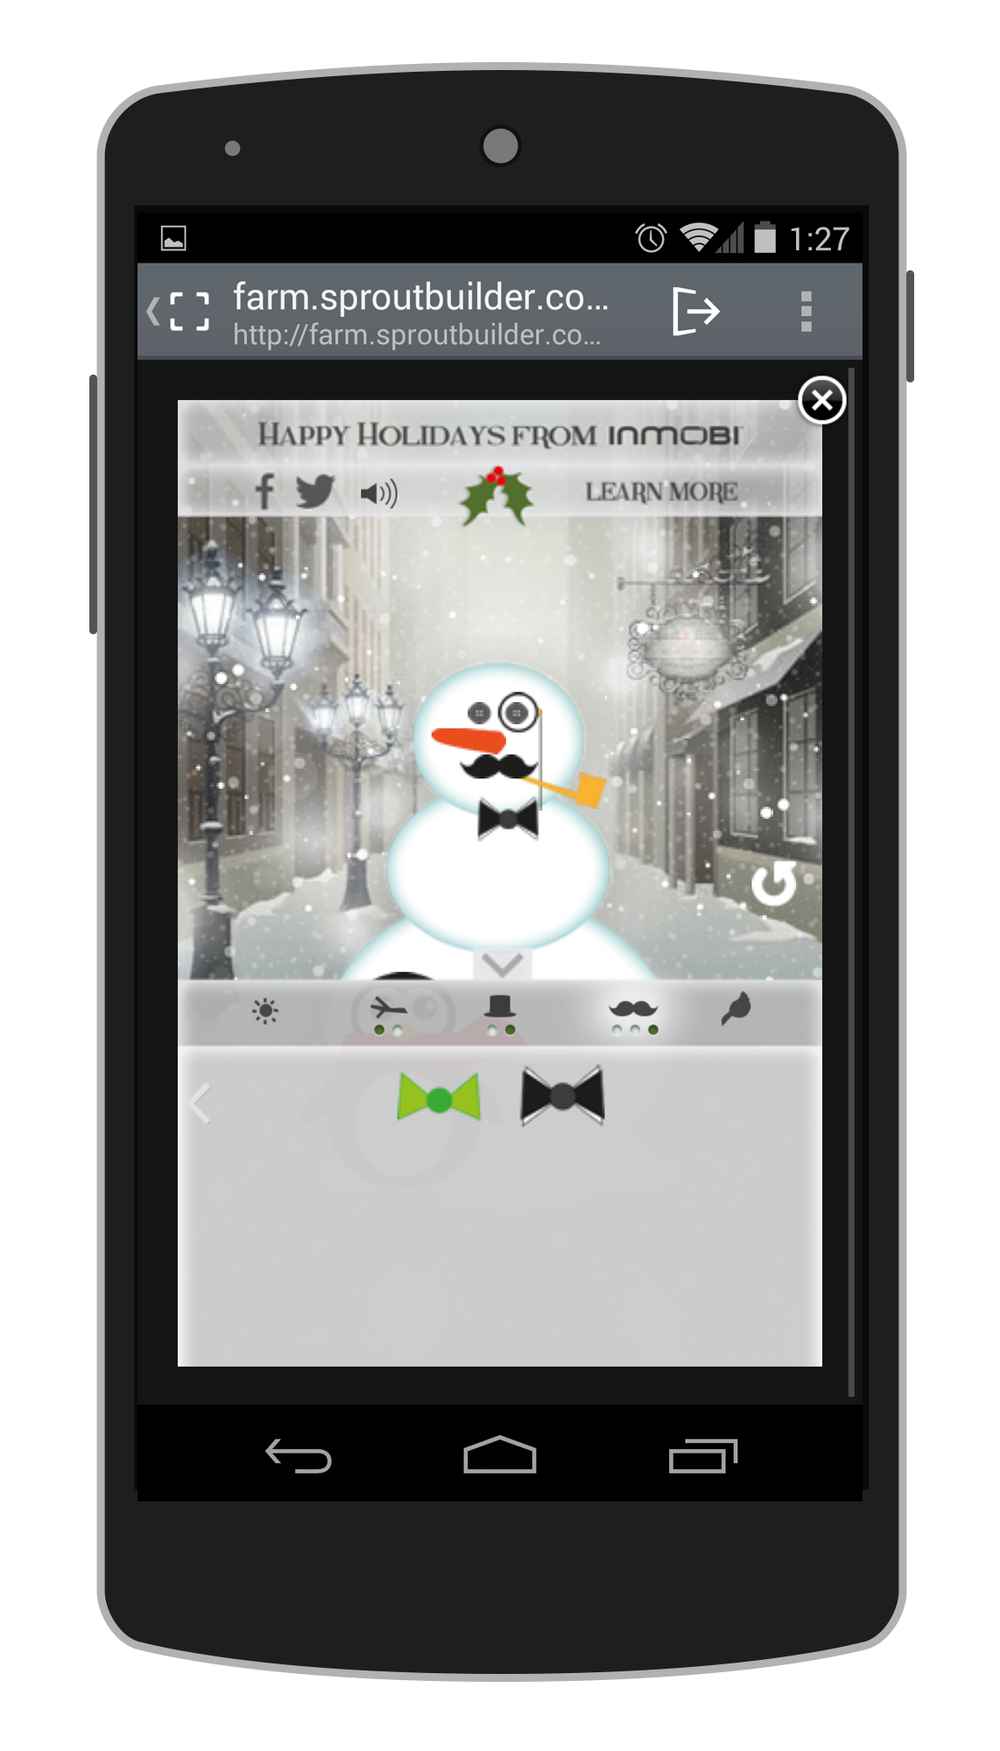 InMobi Christmas Card - Build A Snowman